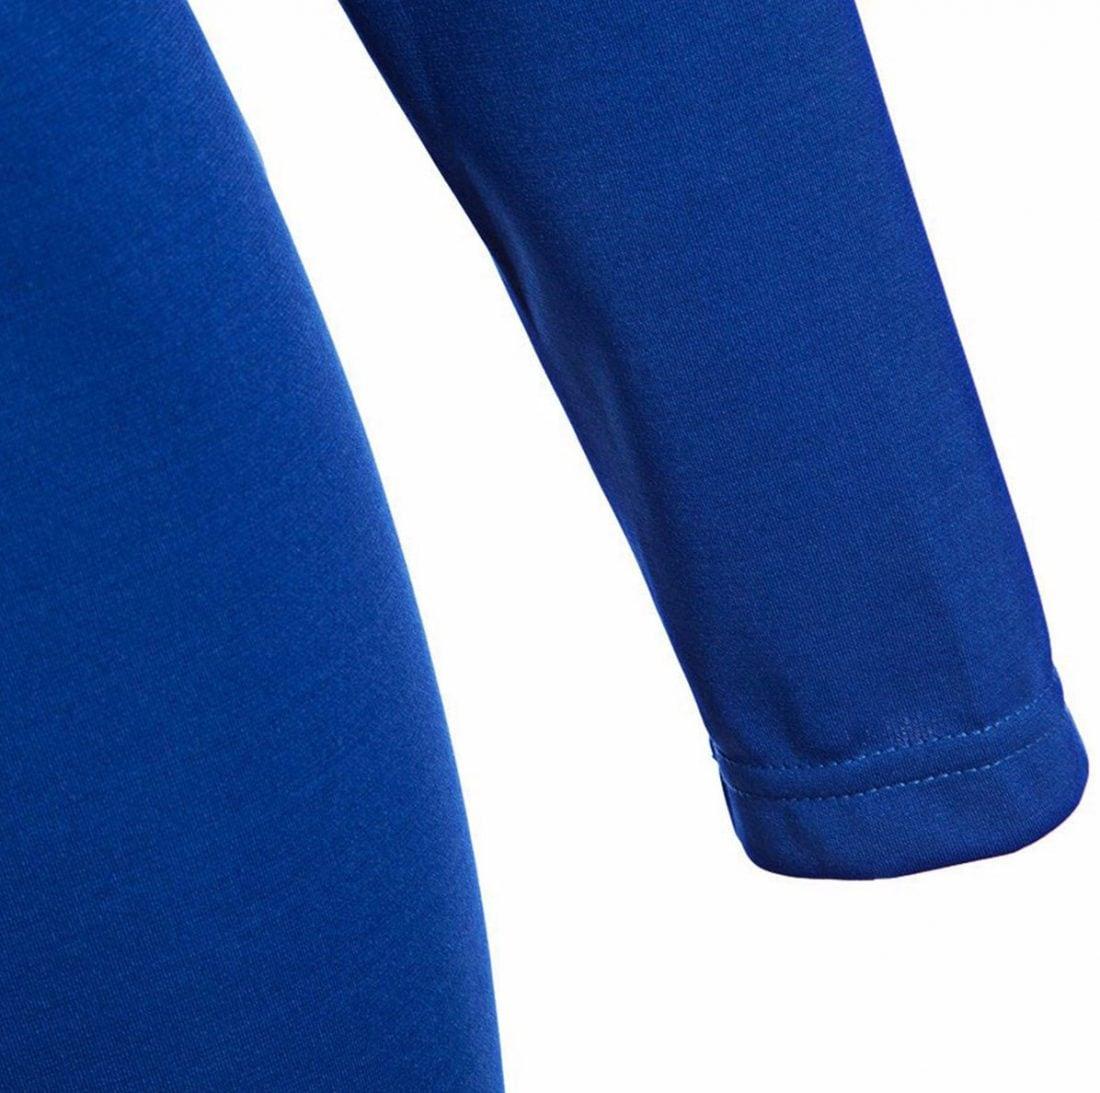 M0185 blue11 Office Evening Dresses maureens.com boutique